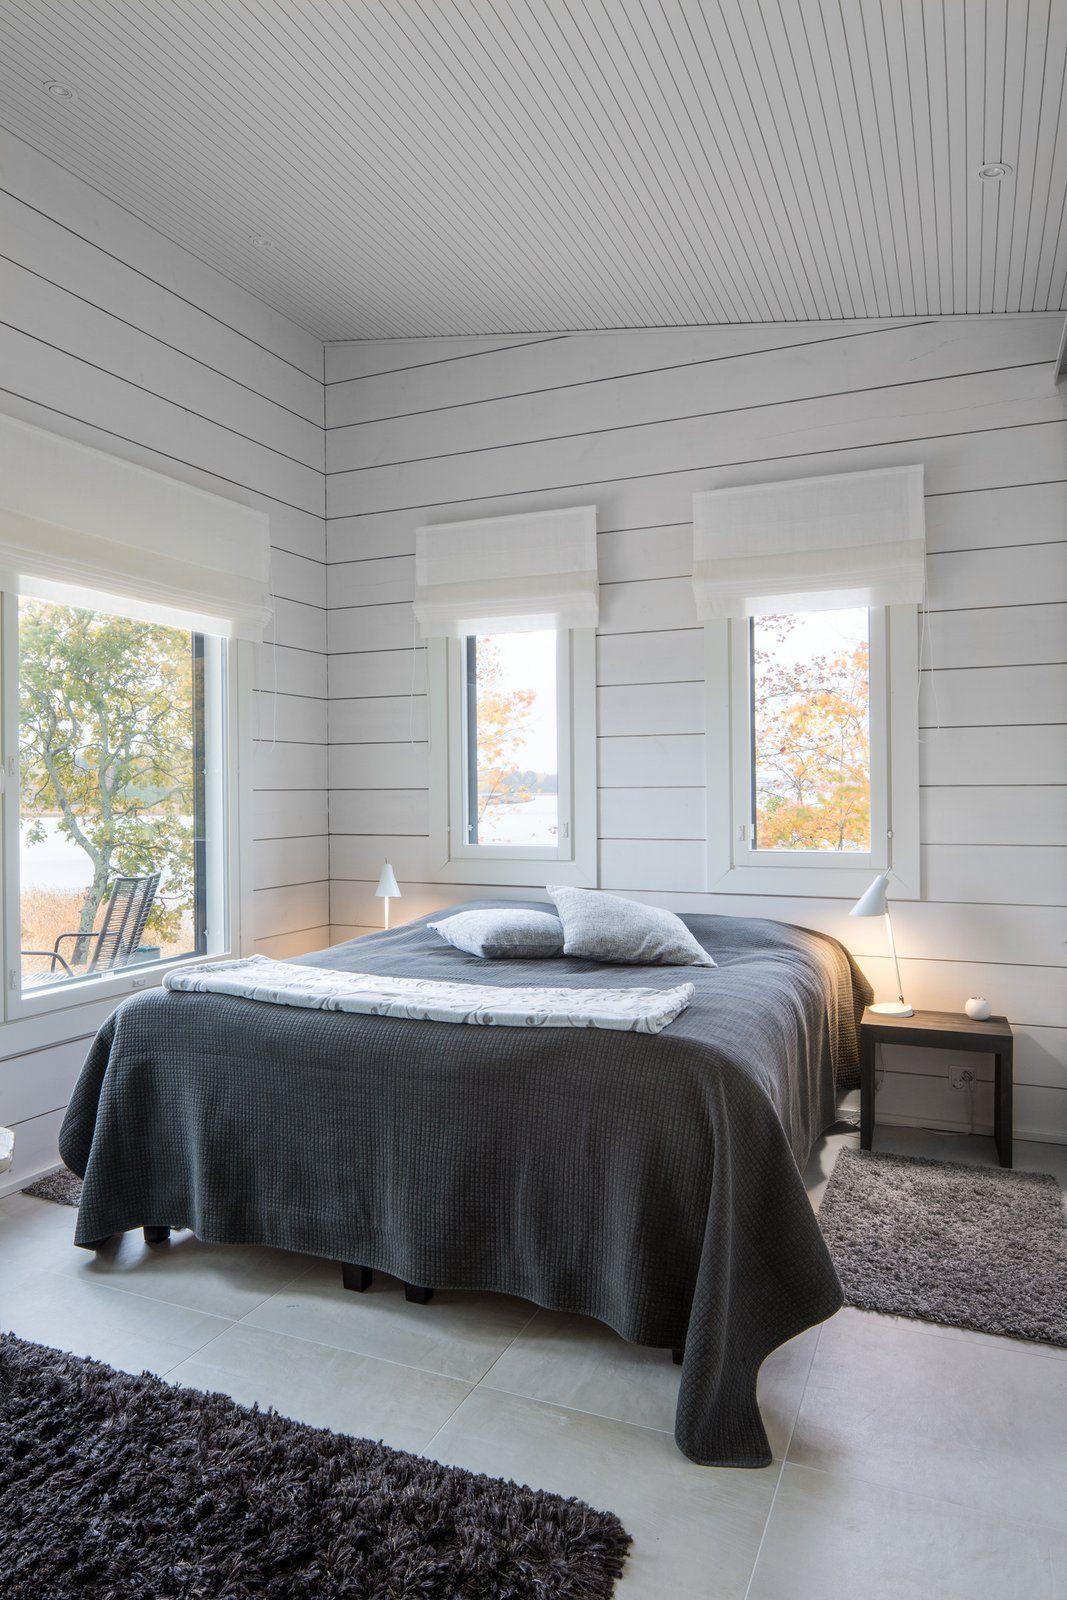 Log Cabin Kit Homes From Finland Cabin Kit Homes Log Cabin Interior Cabin Kits